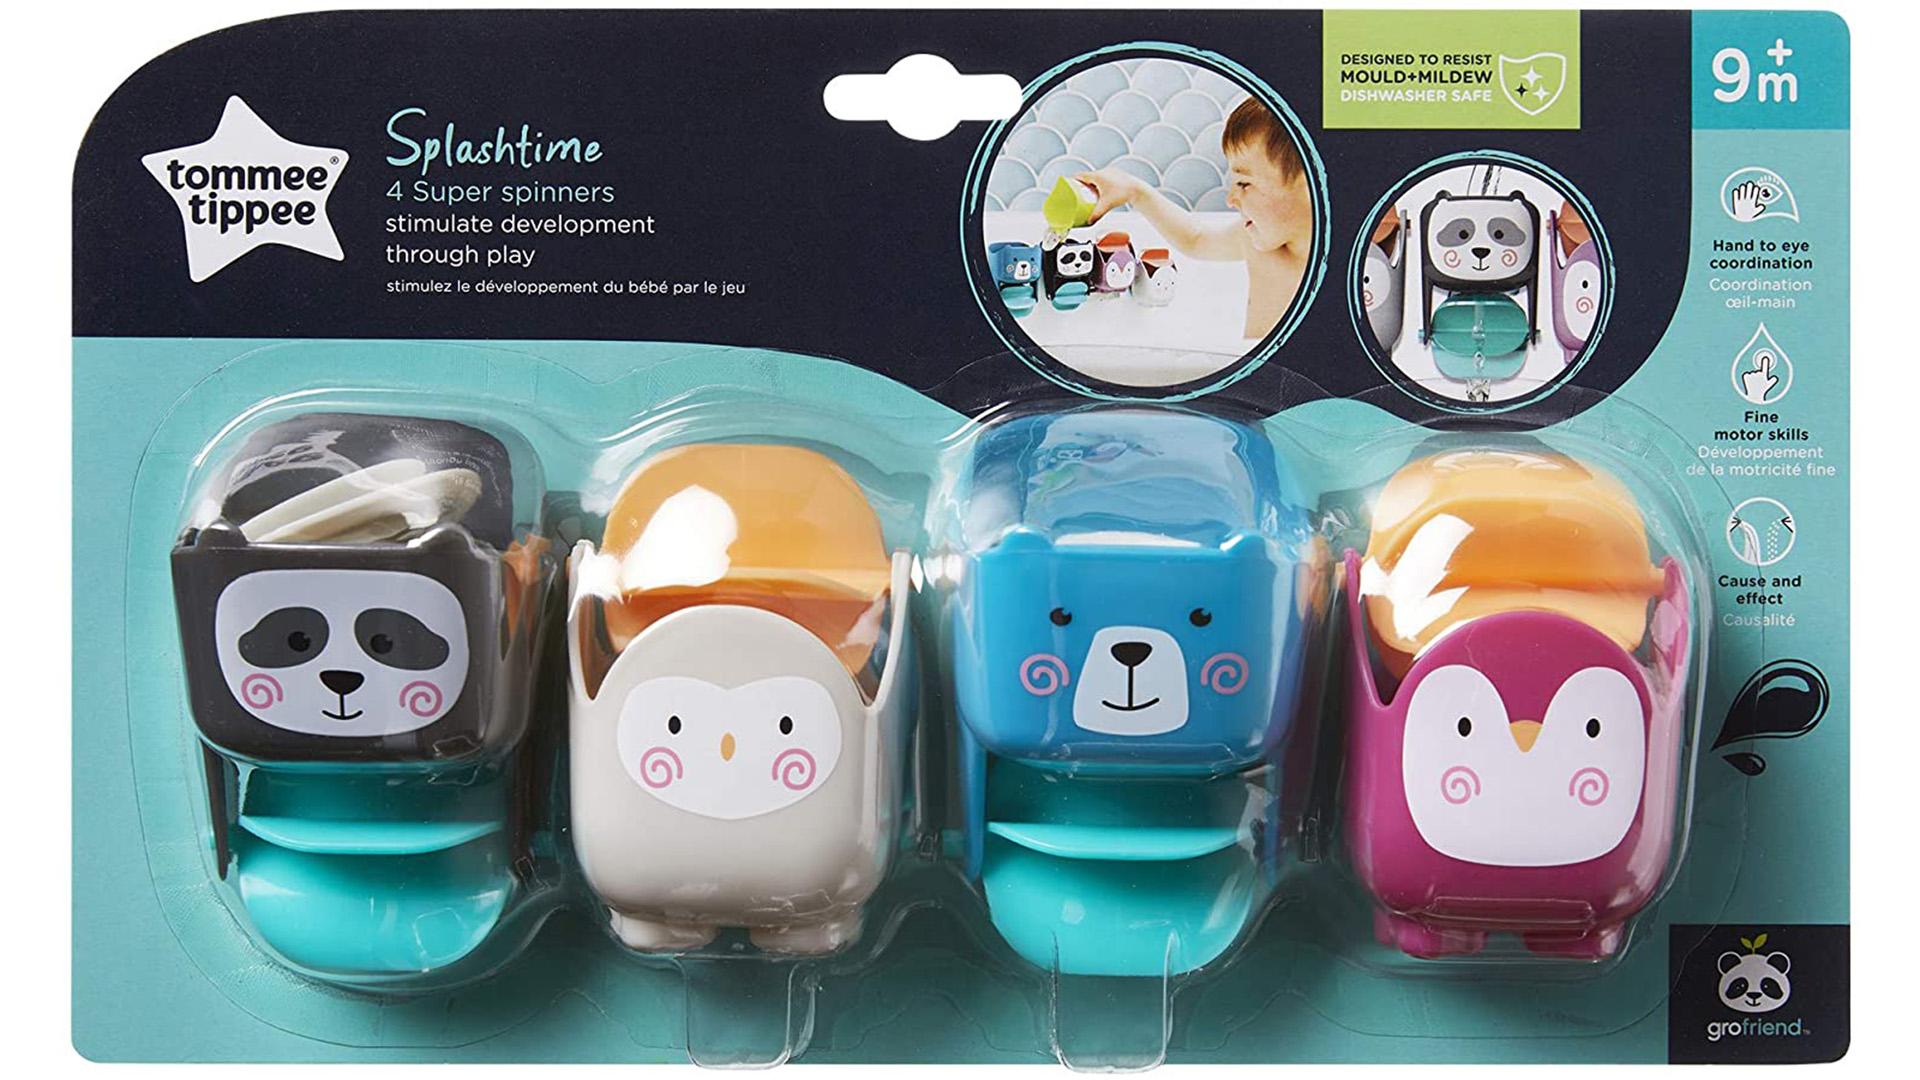 Tommee Tippee Splashtime Super Spinners bath toys